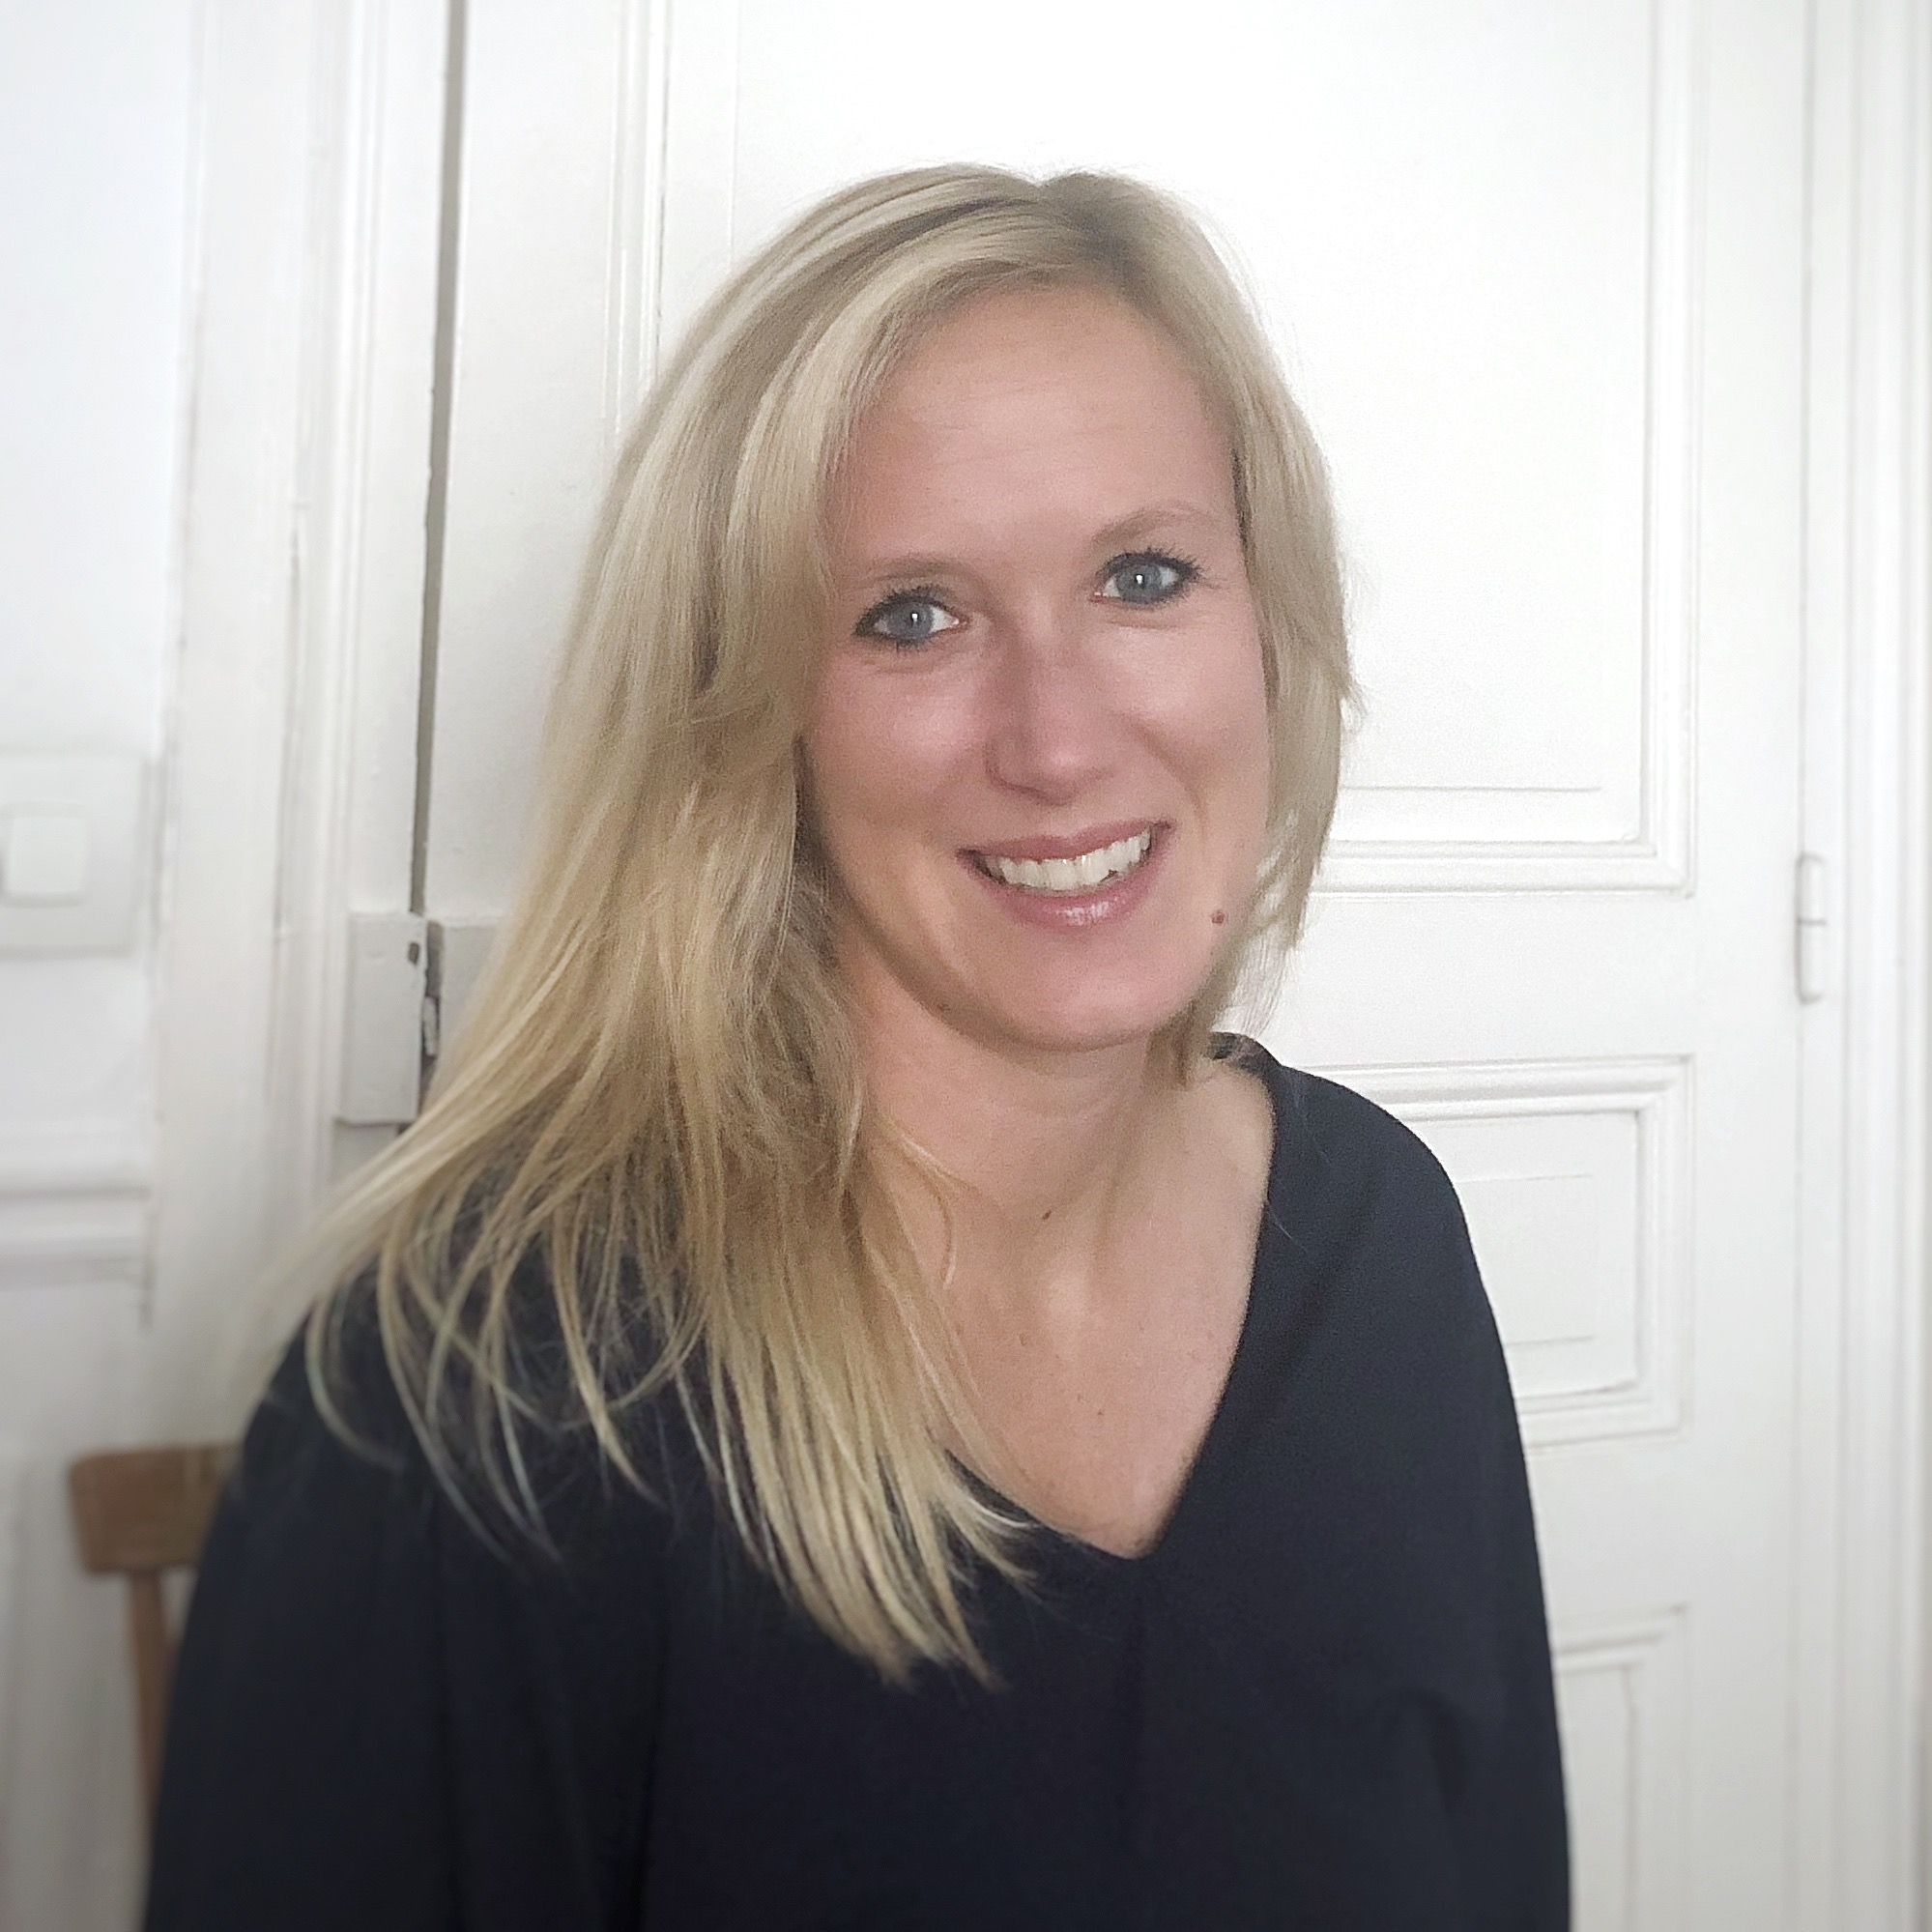 Charlotte Roux